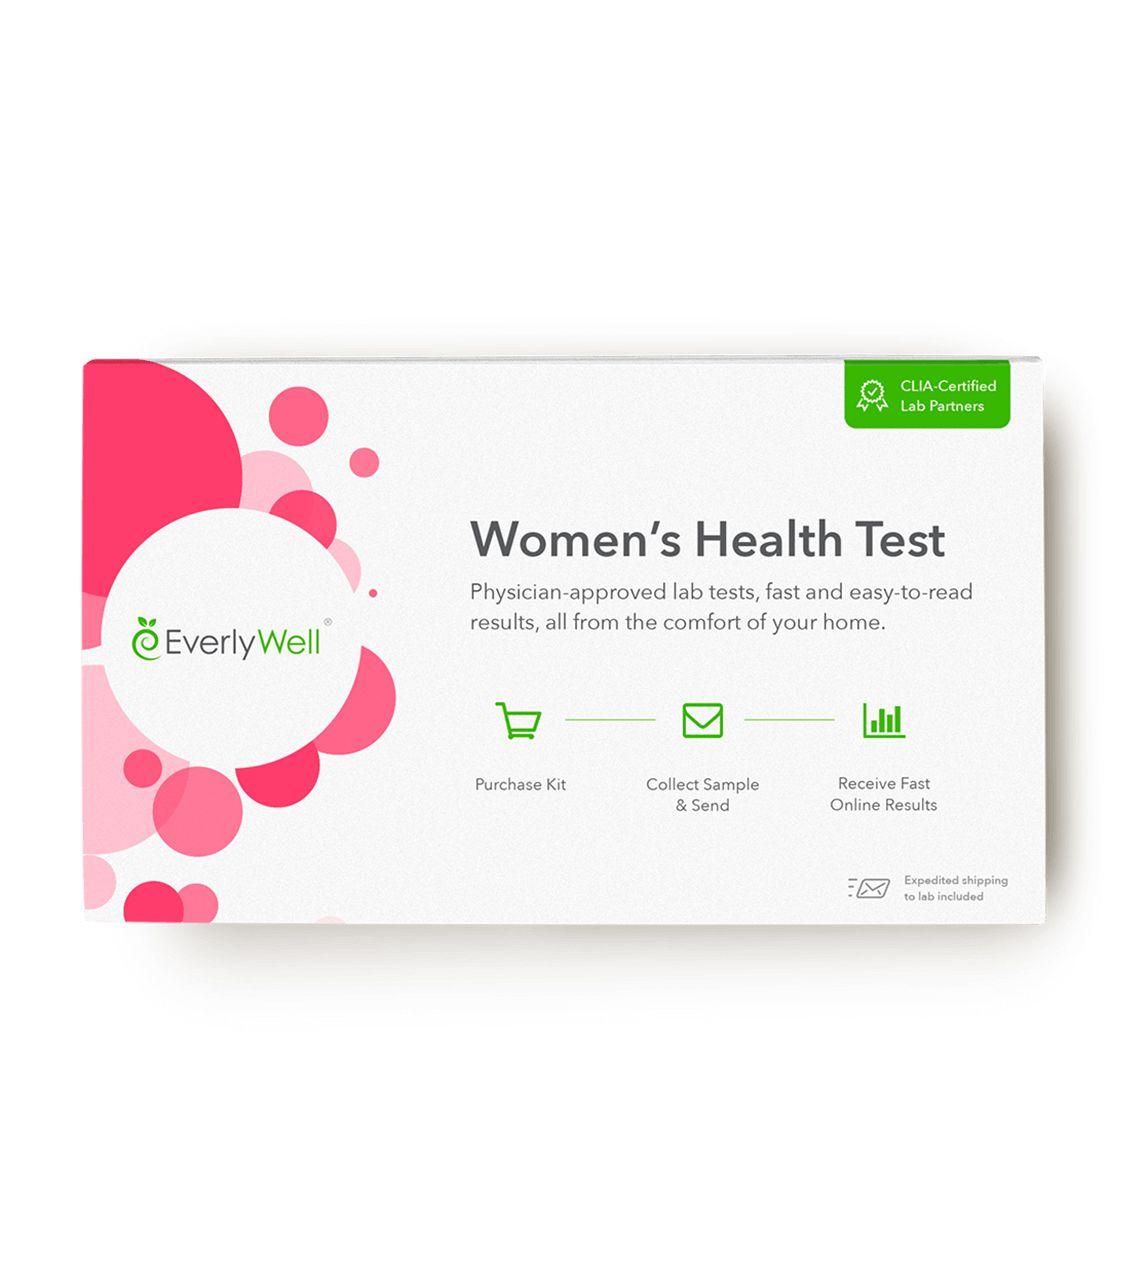 EverlyWell Women's Health Test